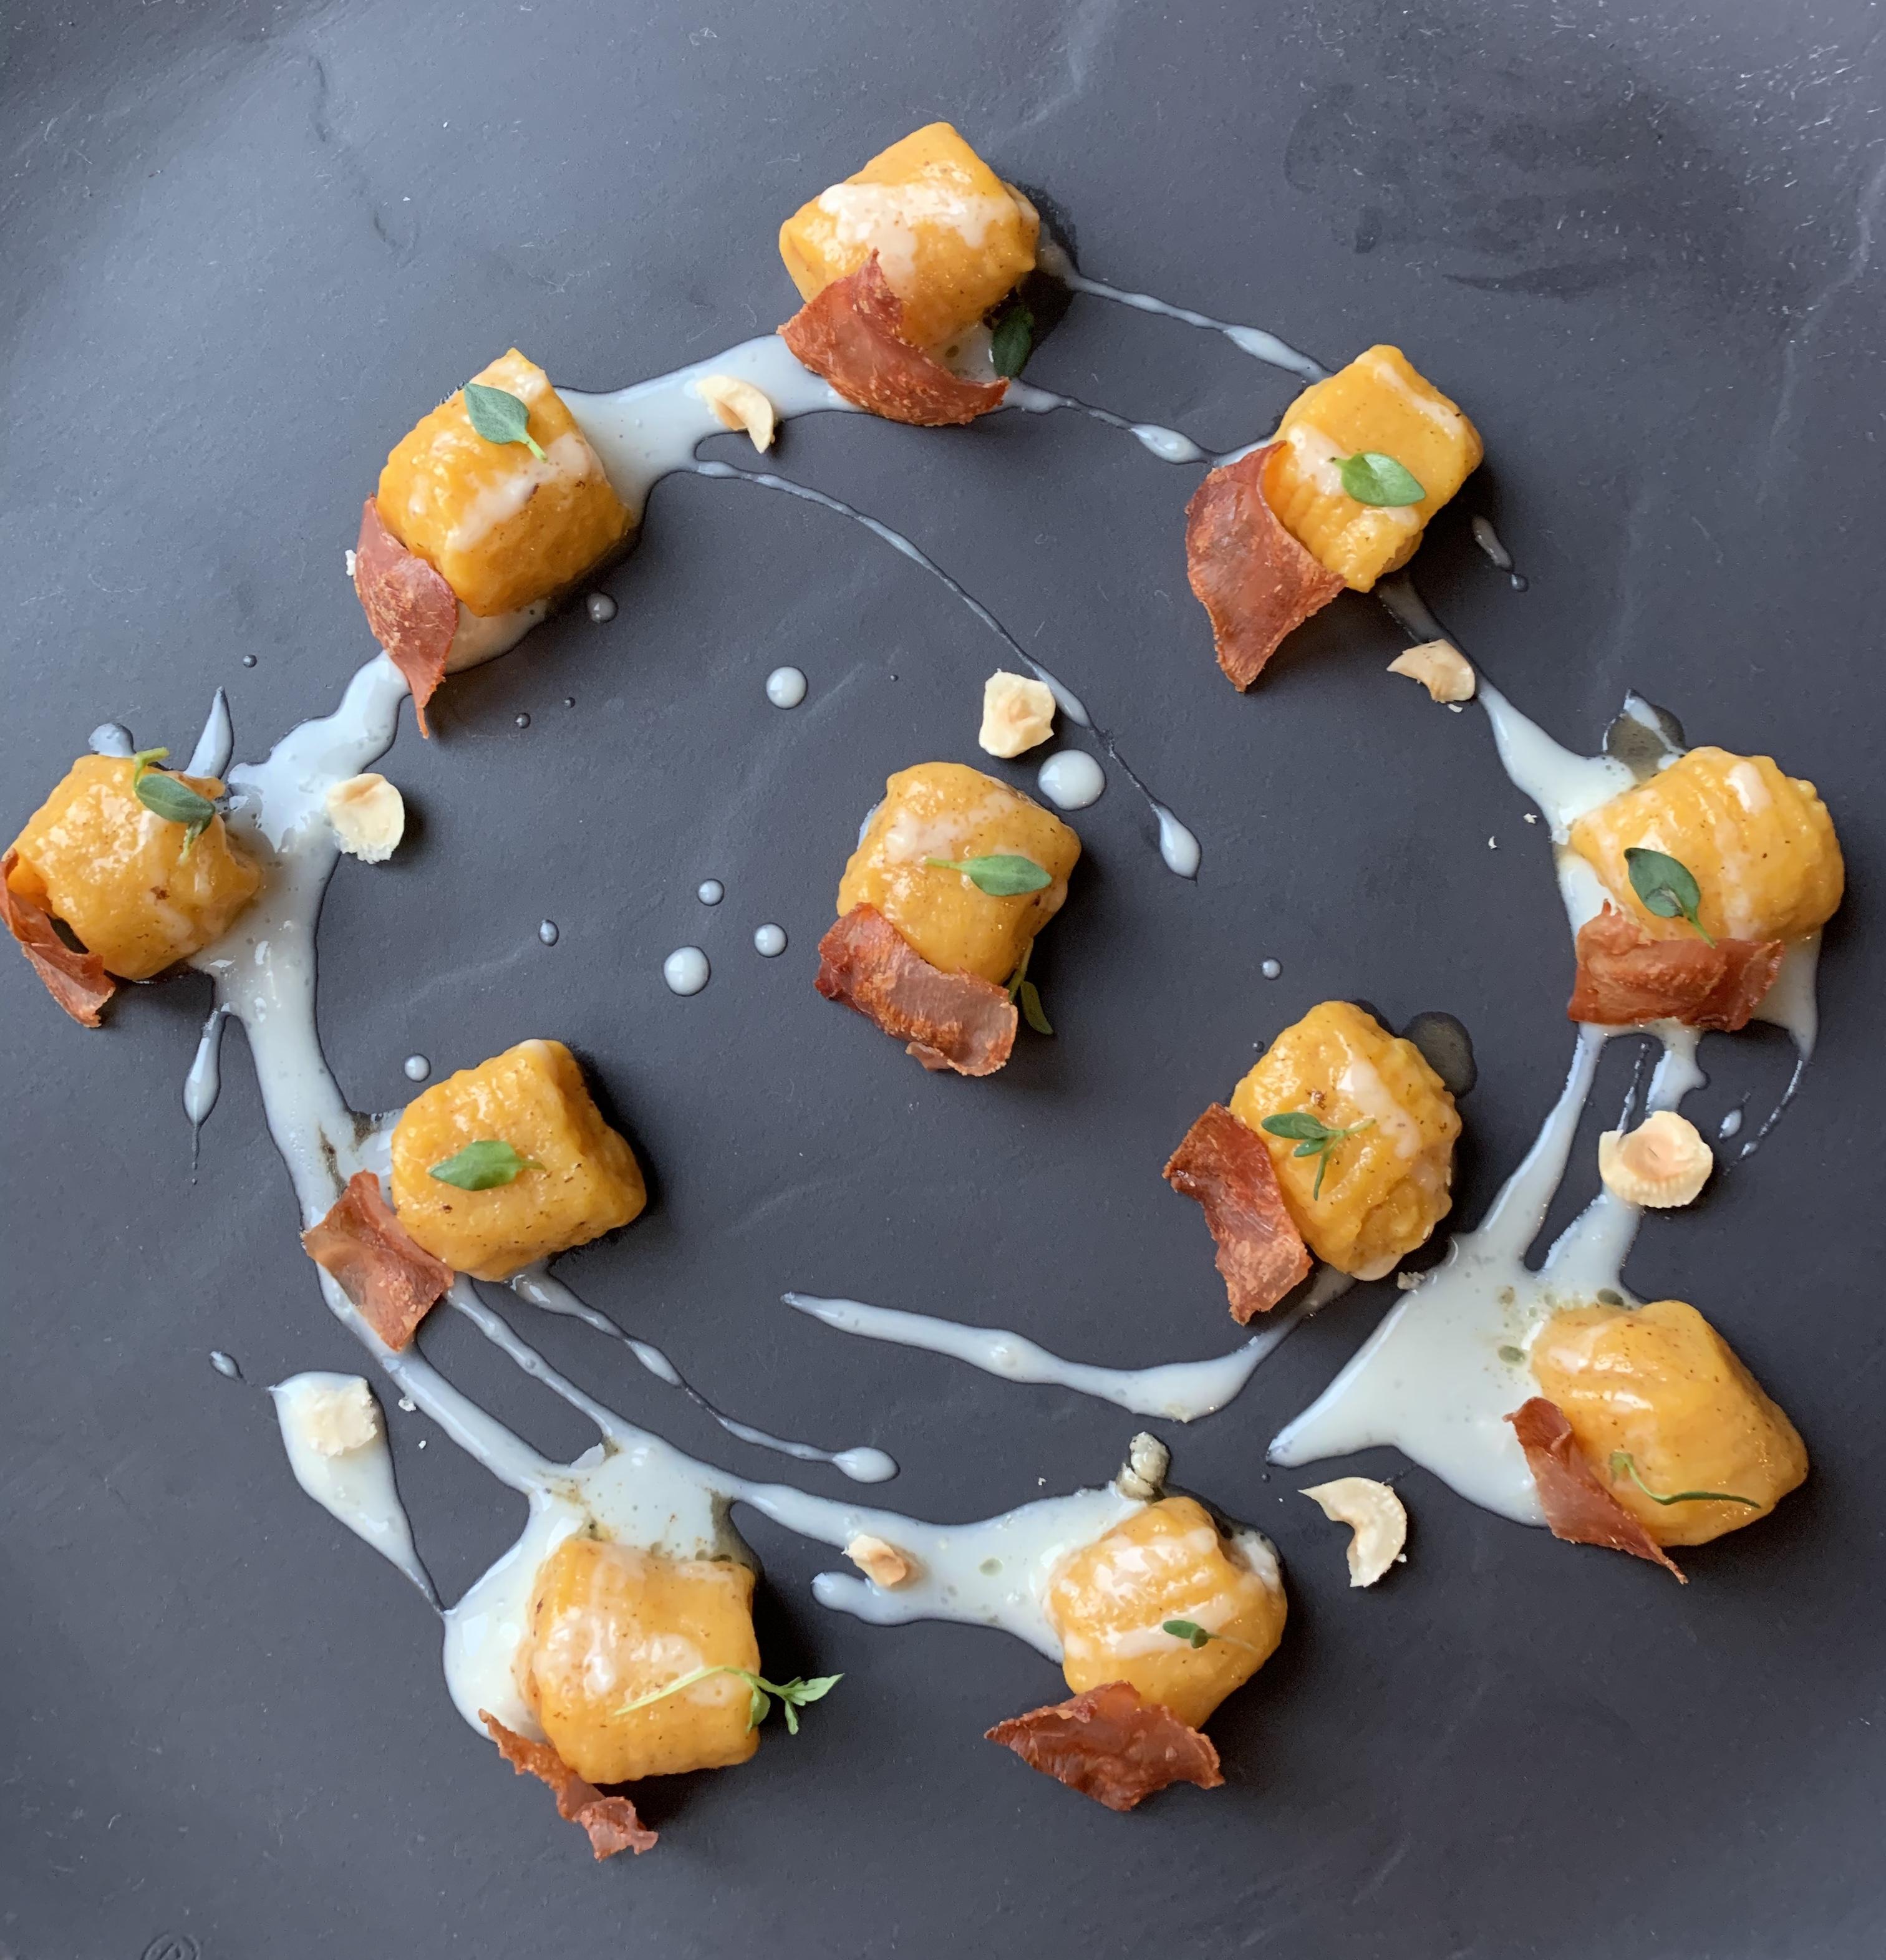 Ricetta Gnocchi Zucca E Gorgonzola.Gnocchi Di Zucca E Crema Di Gorgonzola Zenzero In Cucina